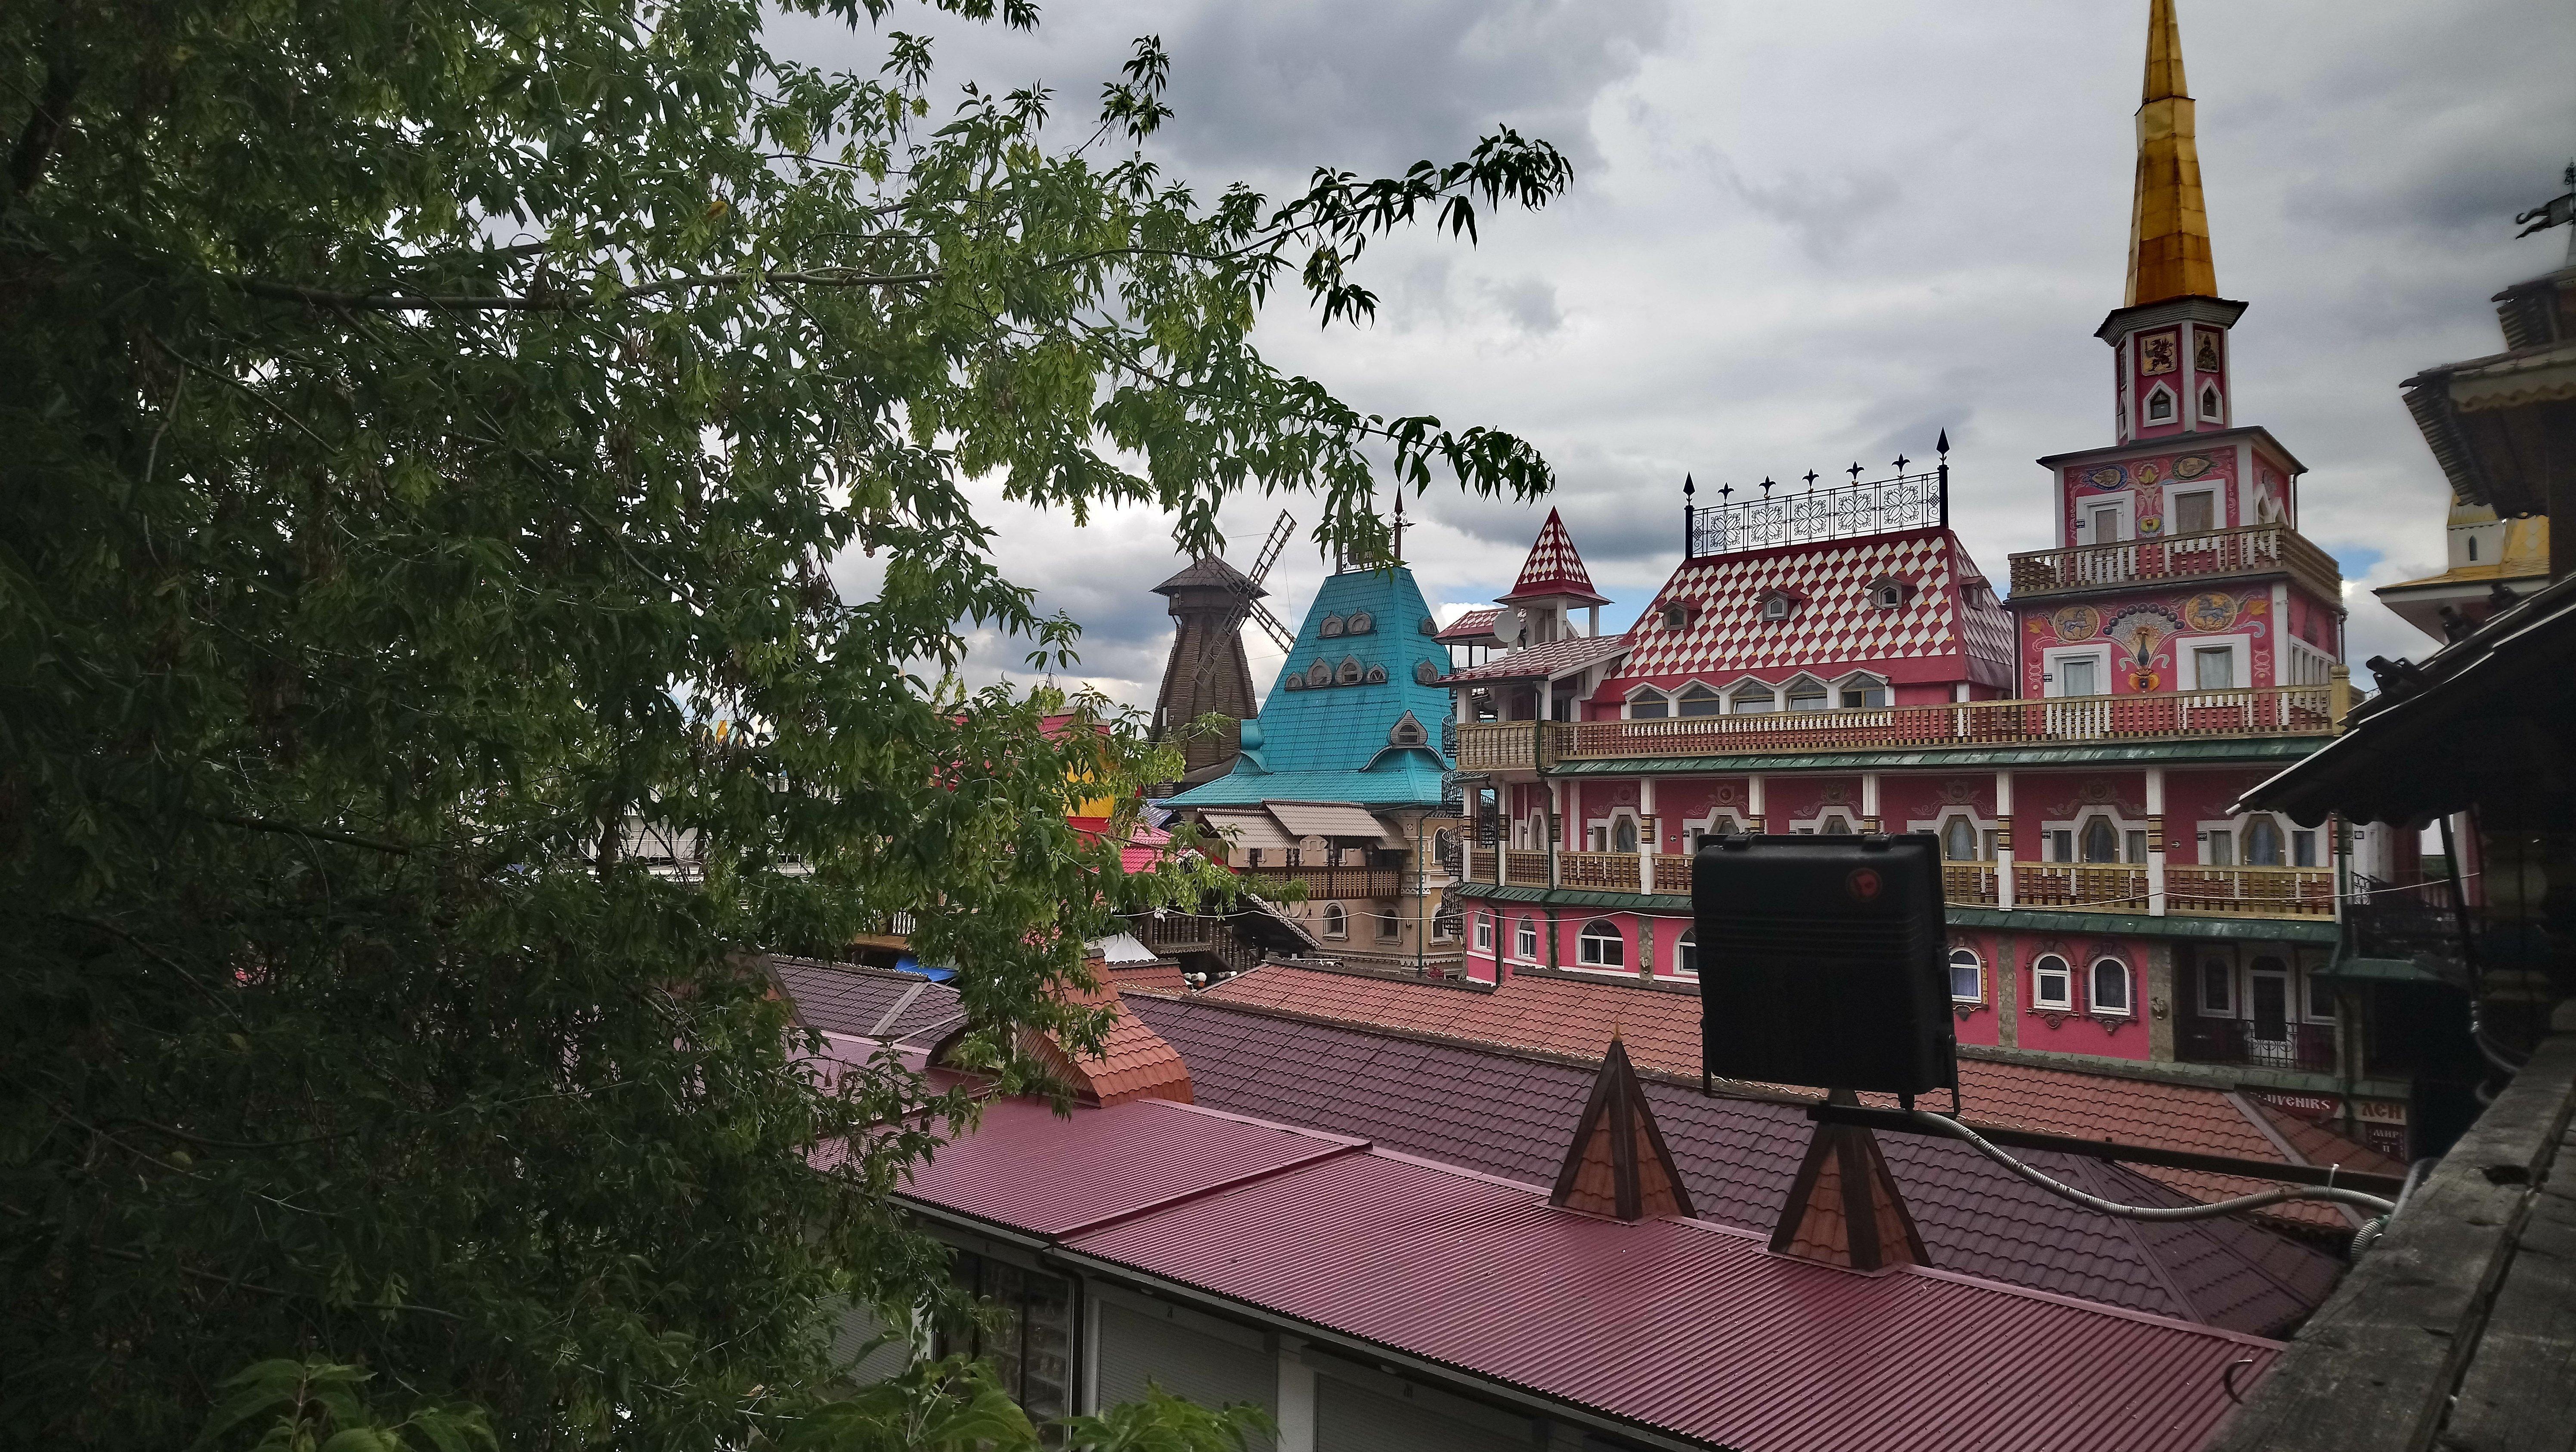 Izamailovo Kremlin in Moscow